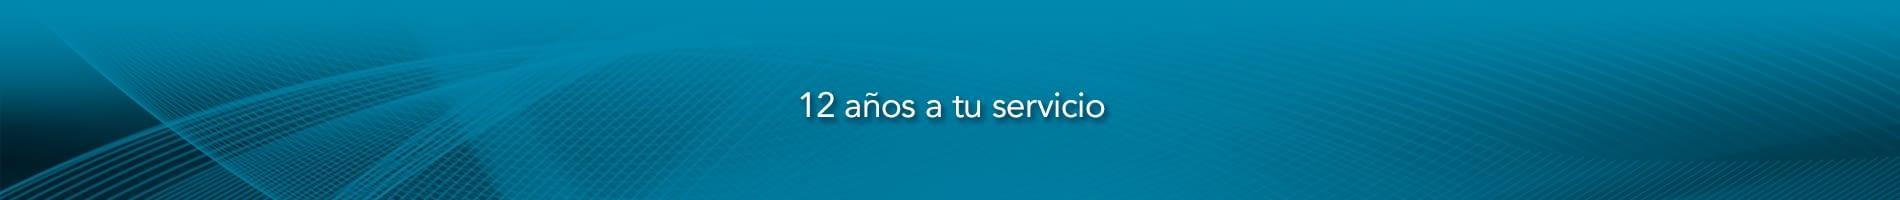 Banner - Nosotros